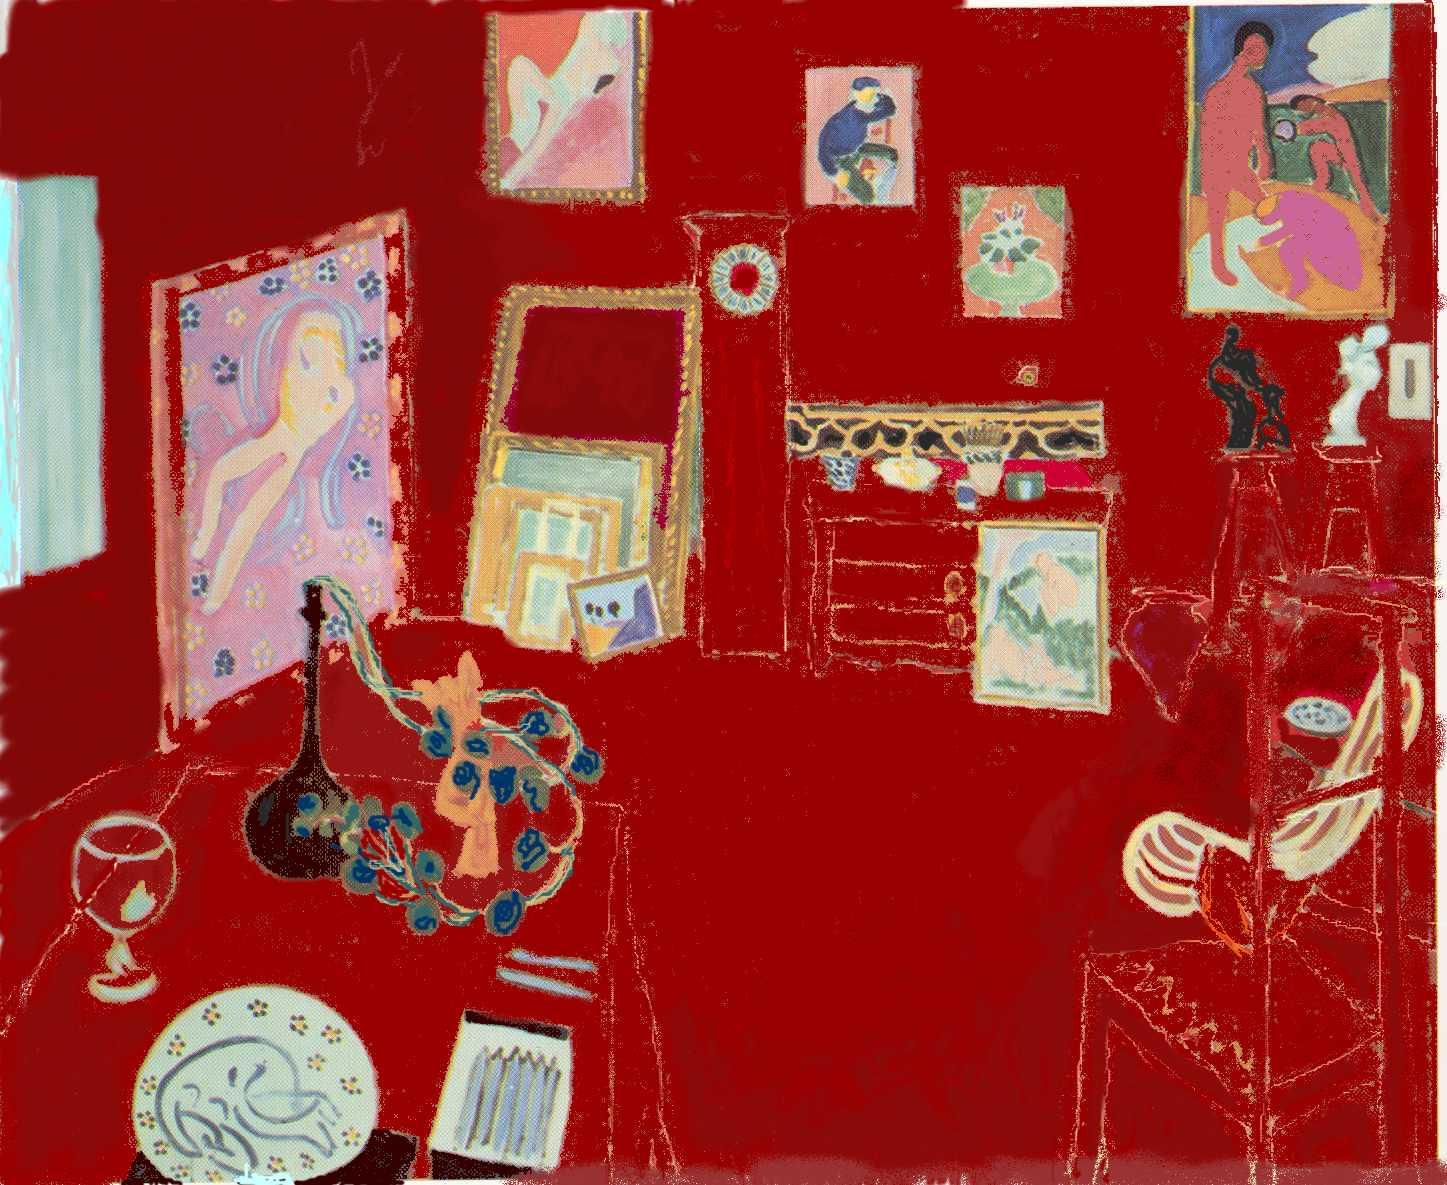 the-red-studio-henri-matisse | Imagine Zero